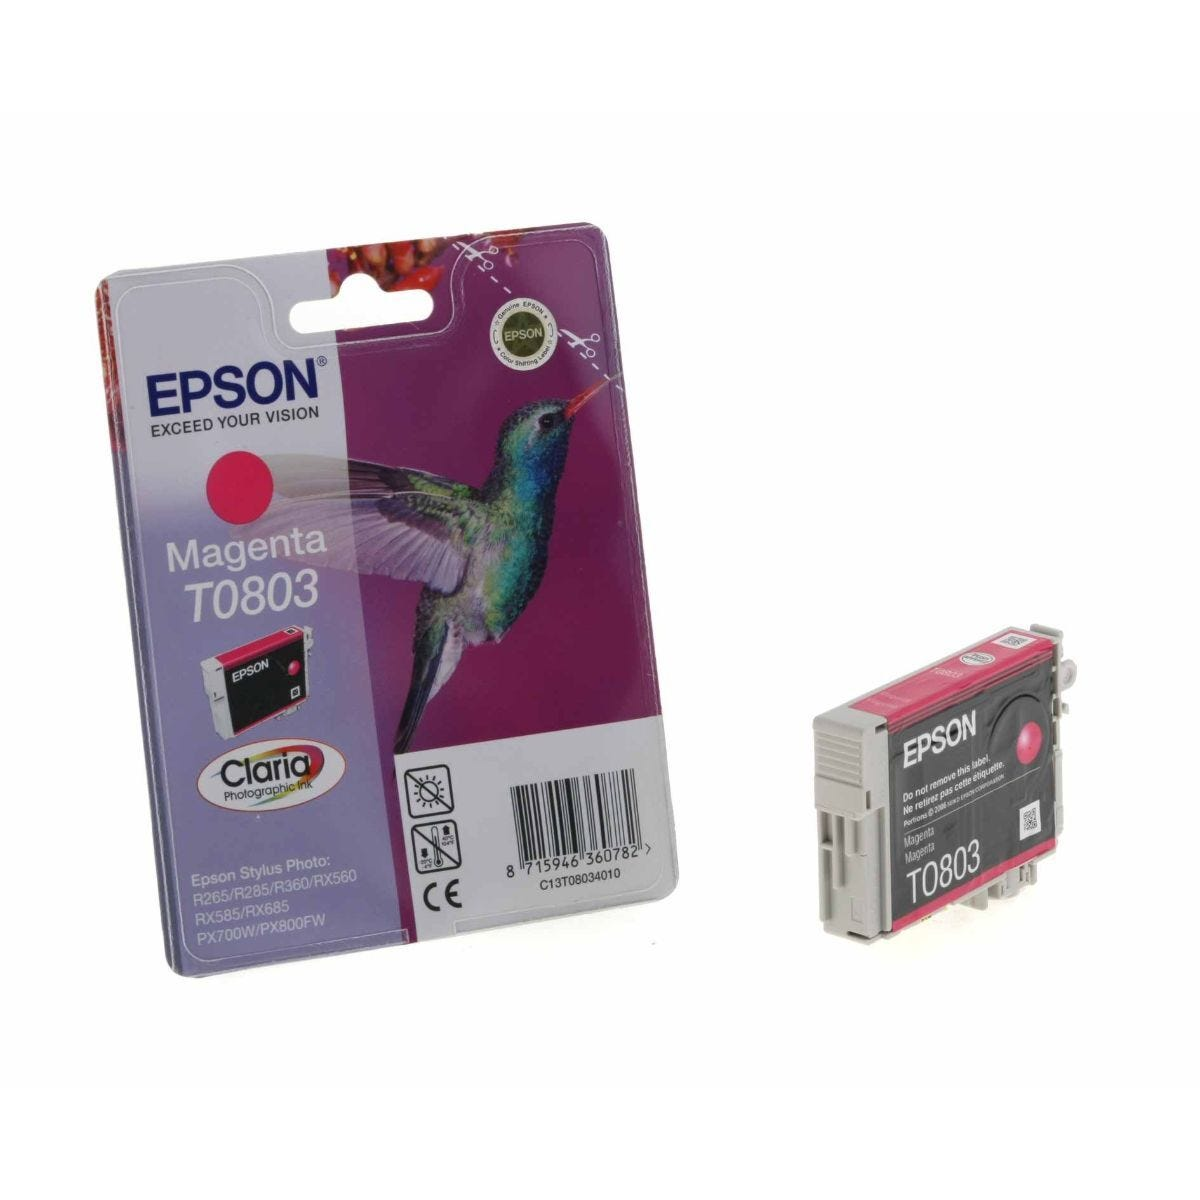 Epson T0803 Ink Cartridge 7.4ml